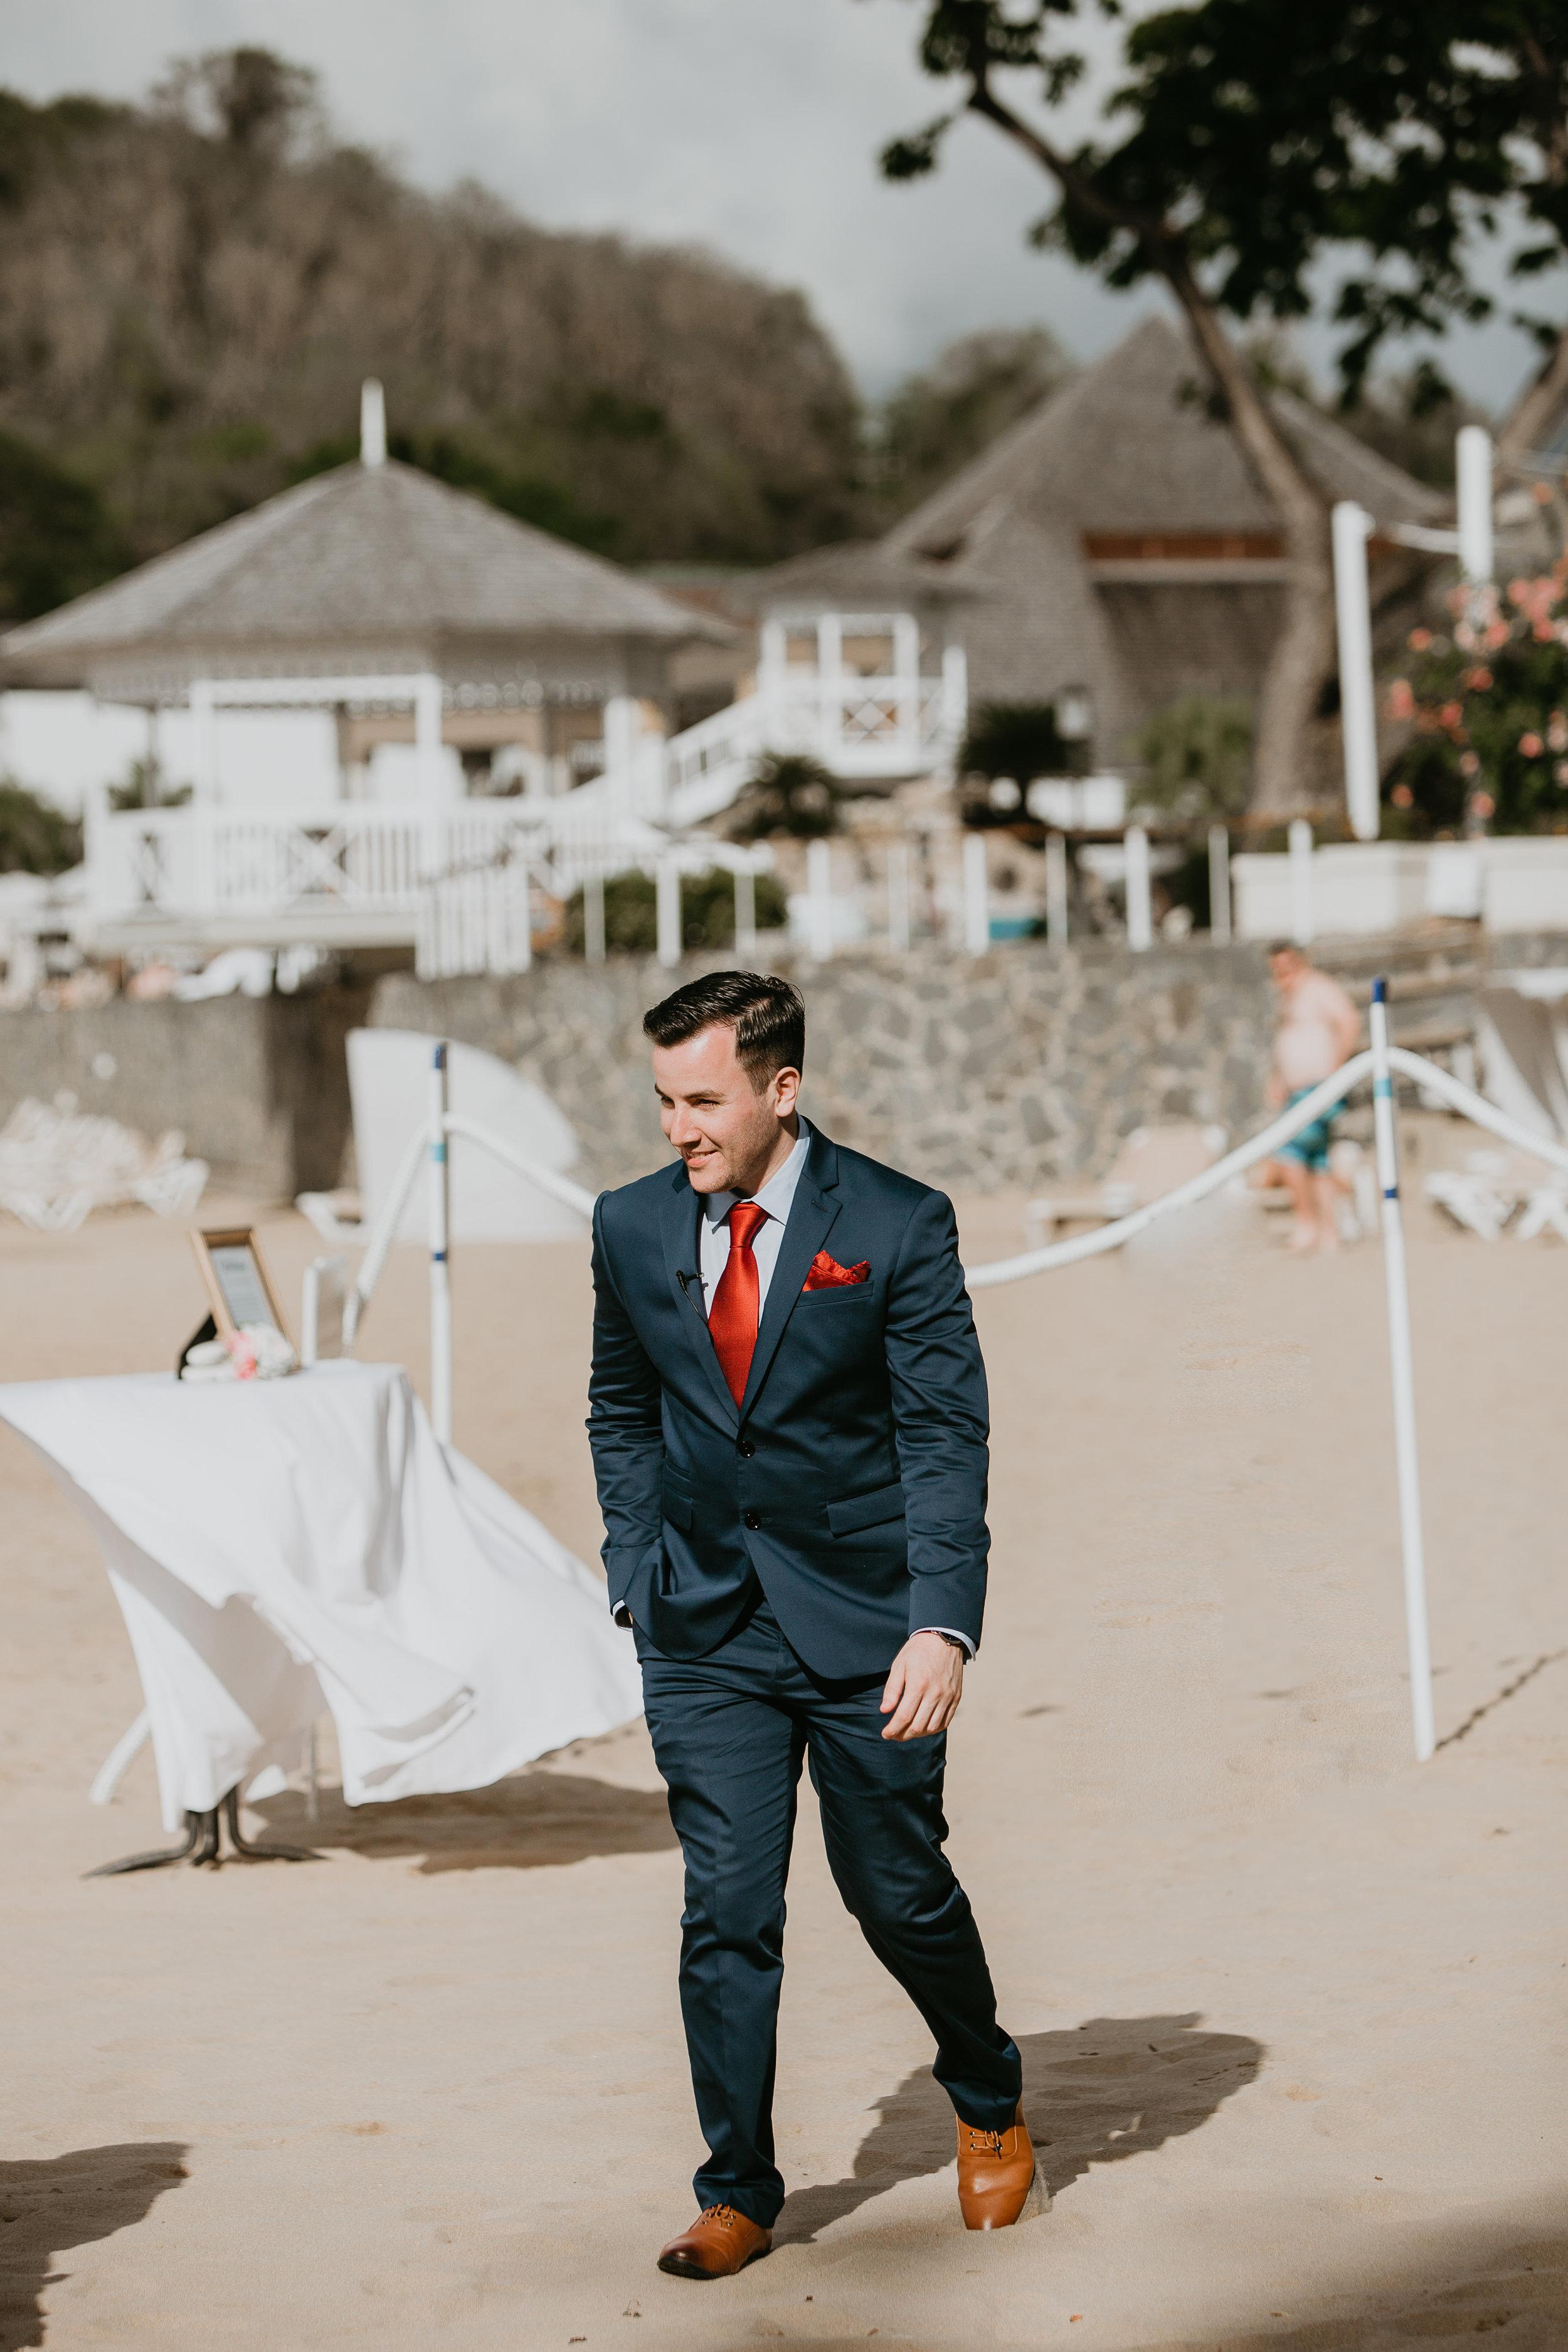 nicole-daacke-photography-destination-wedding-in-st-lucia-sandals-la-toc-intimate-island-wedding-carribean-elopement-photographer-chill-island-wedding-49.jpg